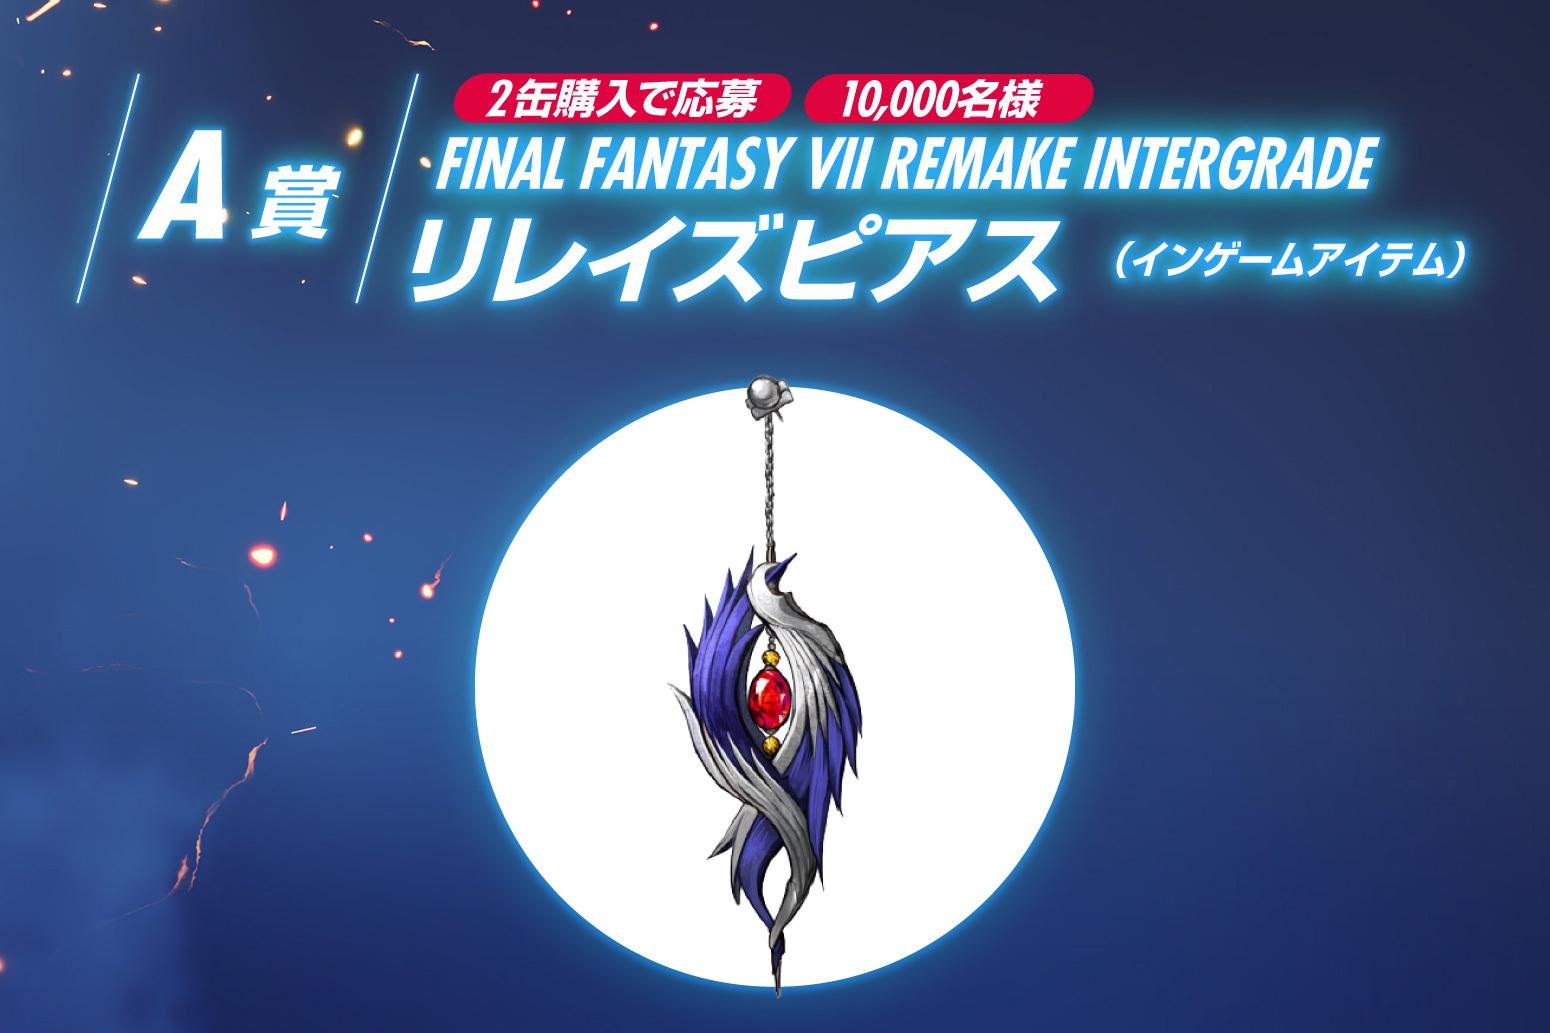 FINAL FANTASY VII REMAKE INTERGRADE リレイズピアス(インゲームアイテム)